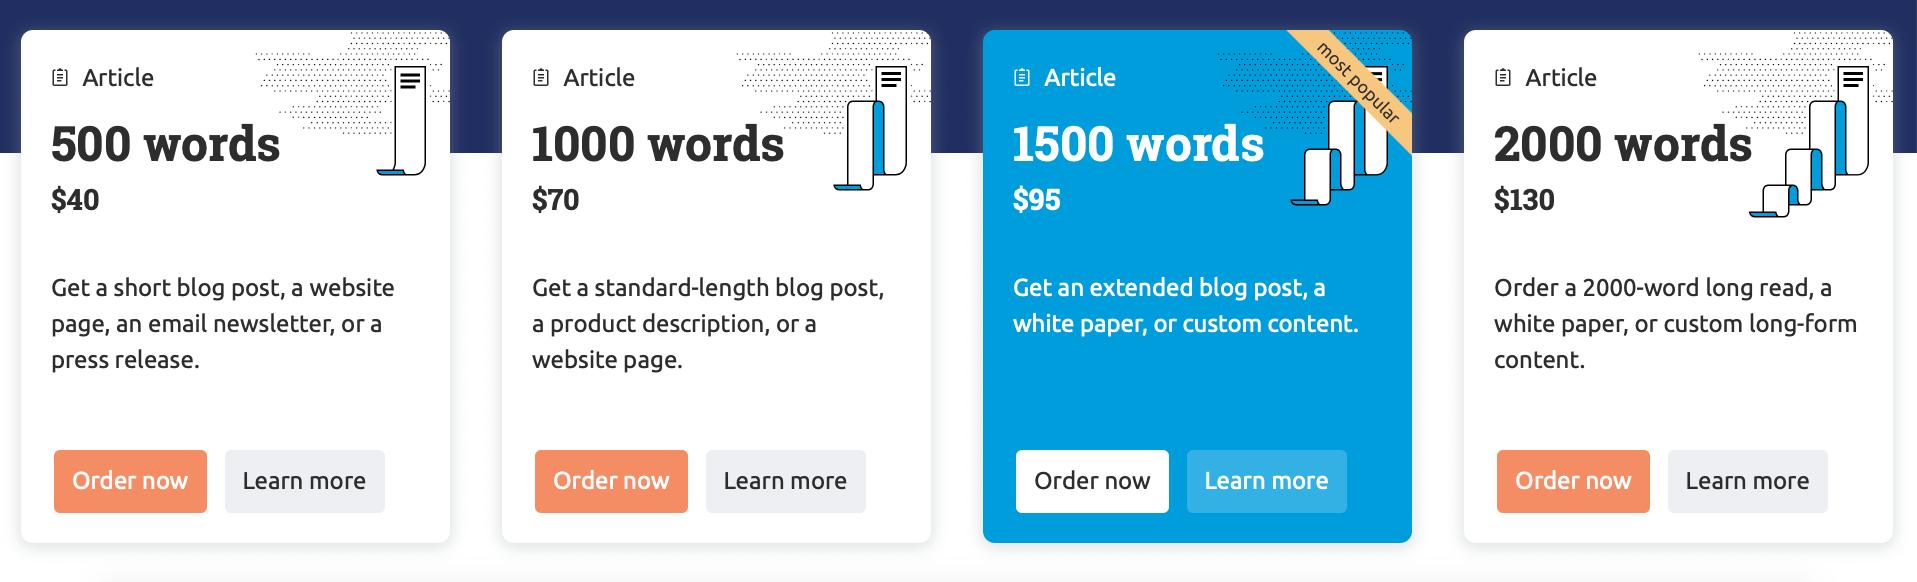 SEMrush Content Marketplace offers